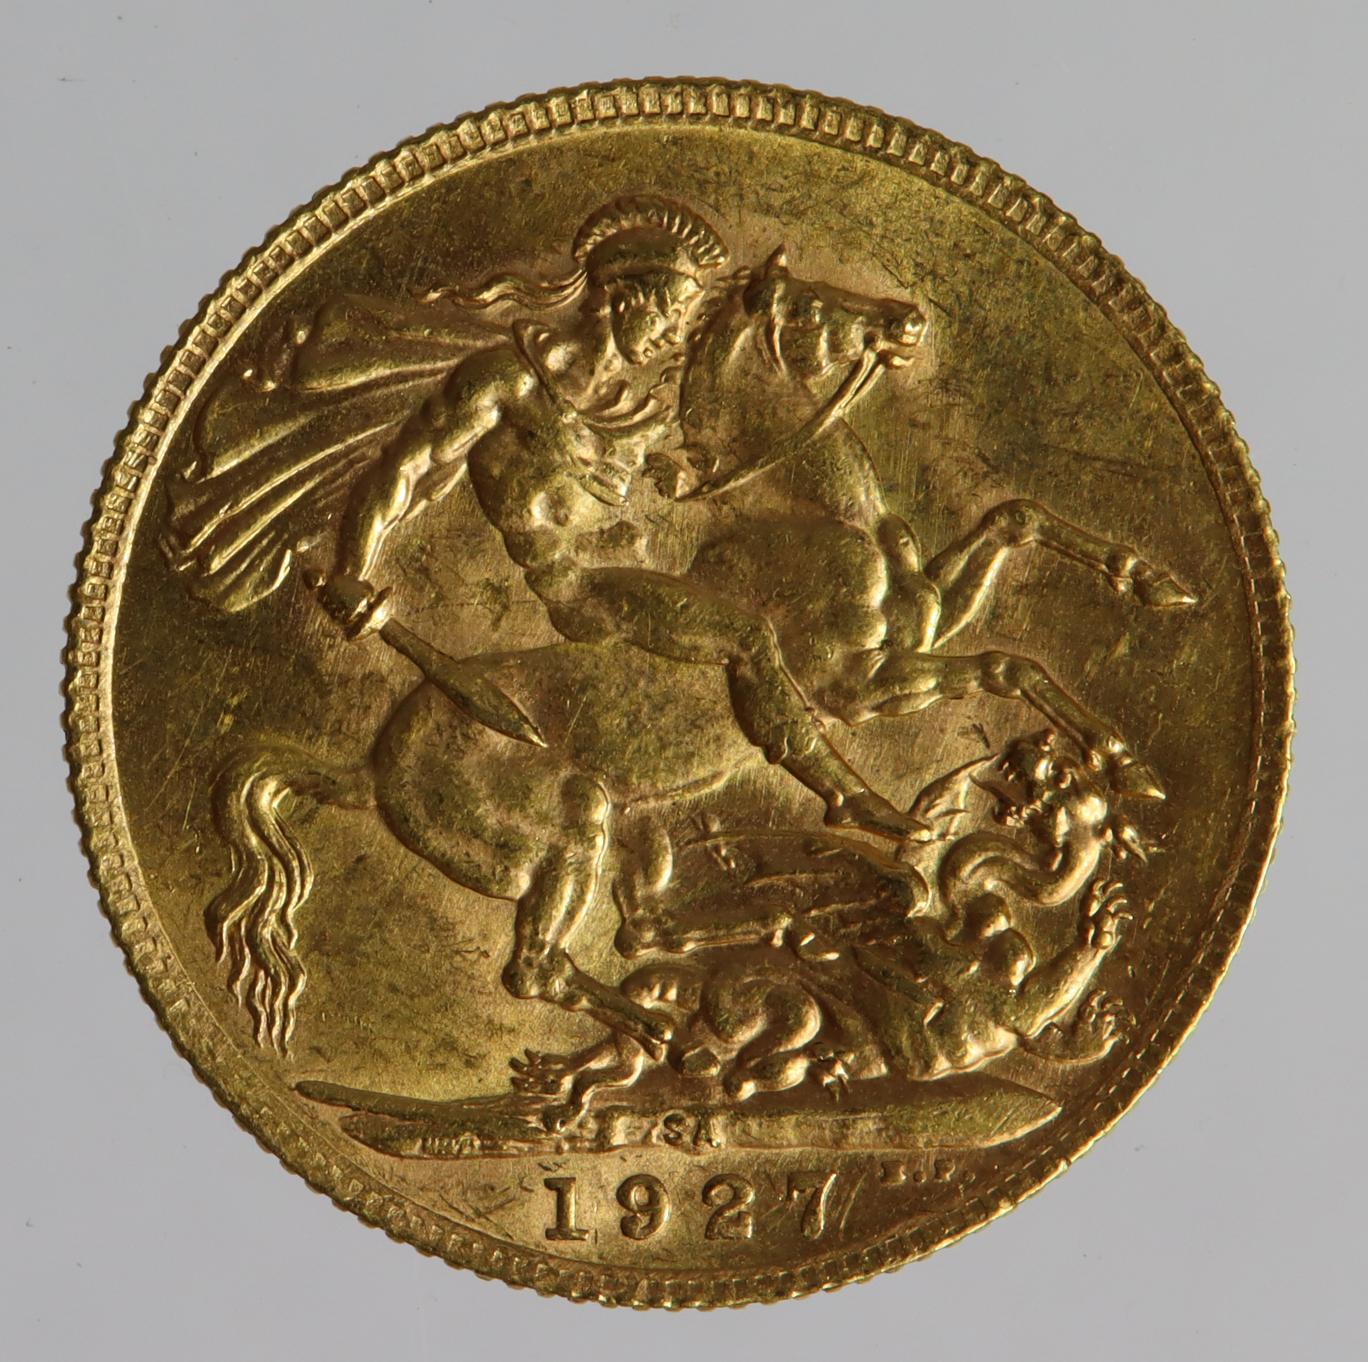 Sovereign 1927SA, Pretoria Mint, South Africa, EF, a few marks. - Image 2 of 2